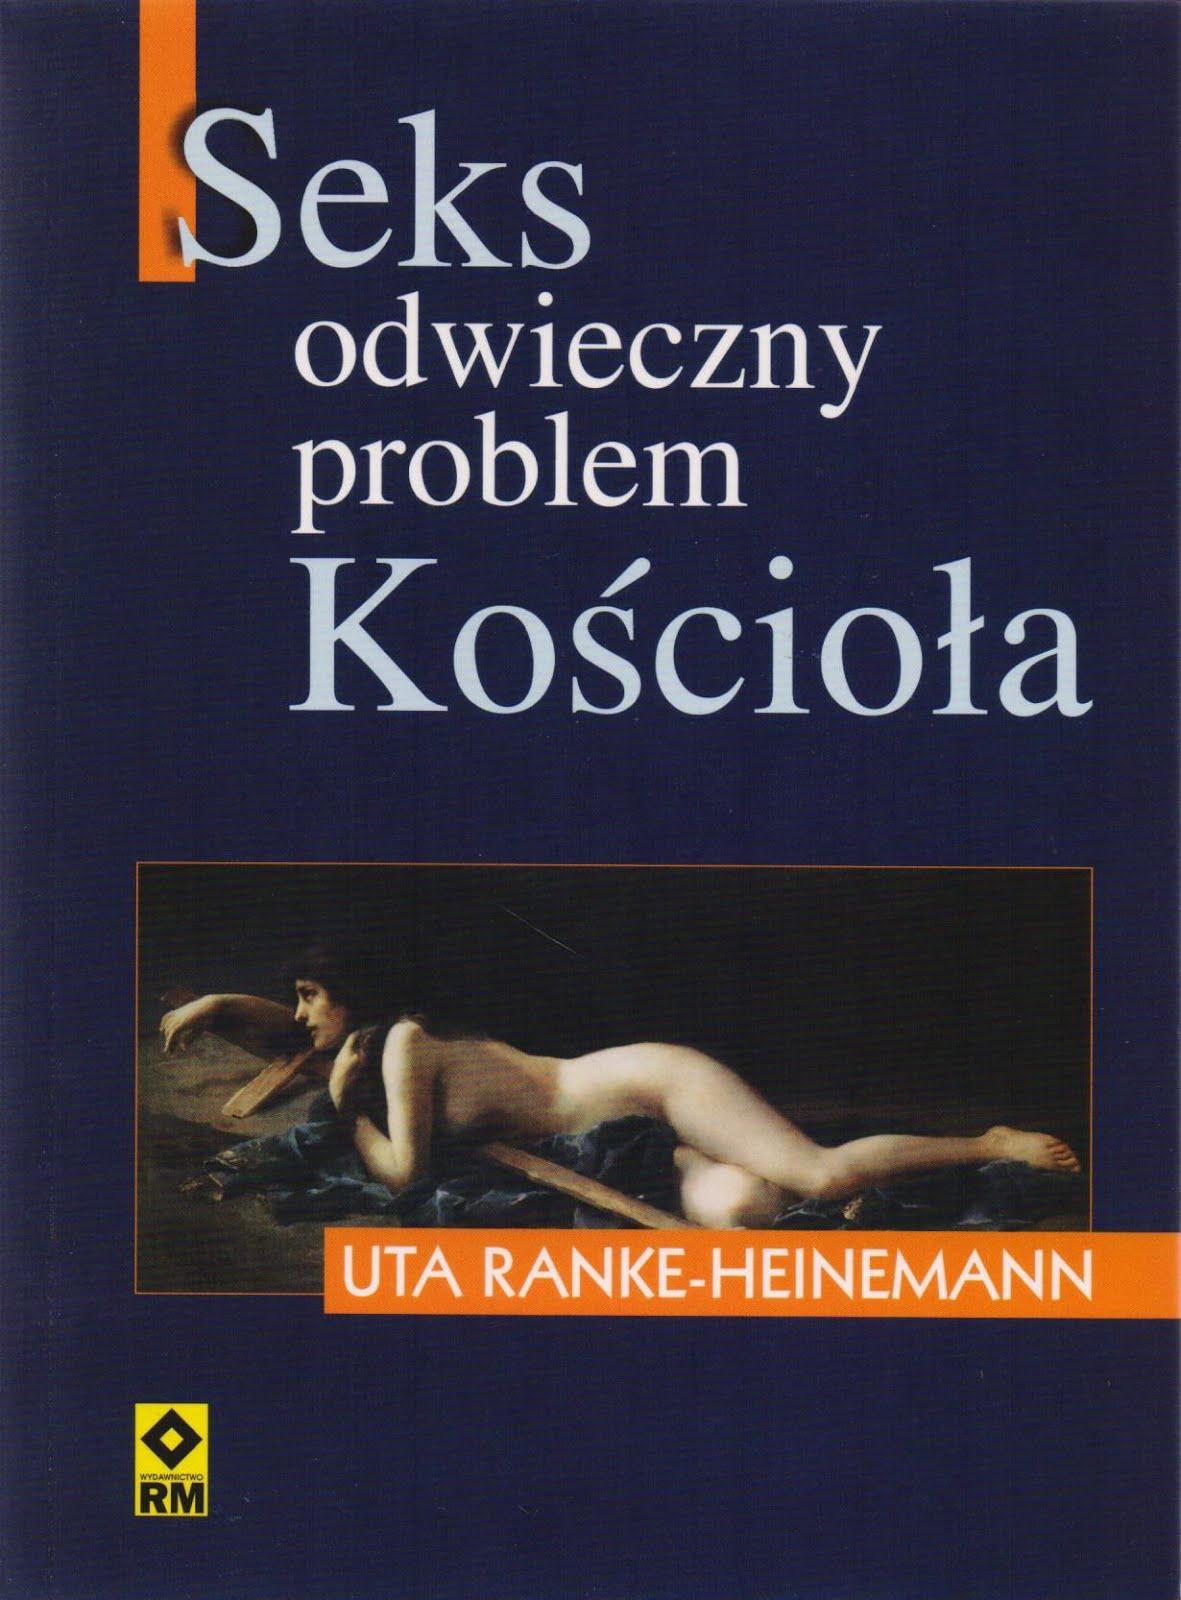 Seks problemem Kościoła